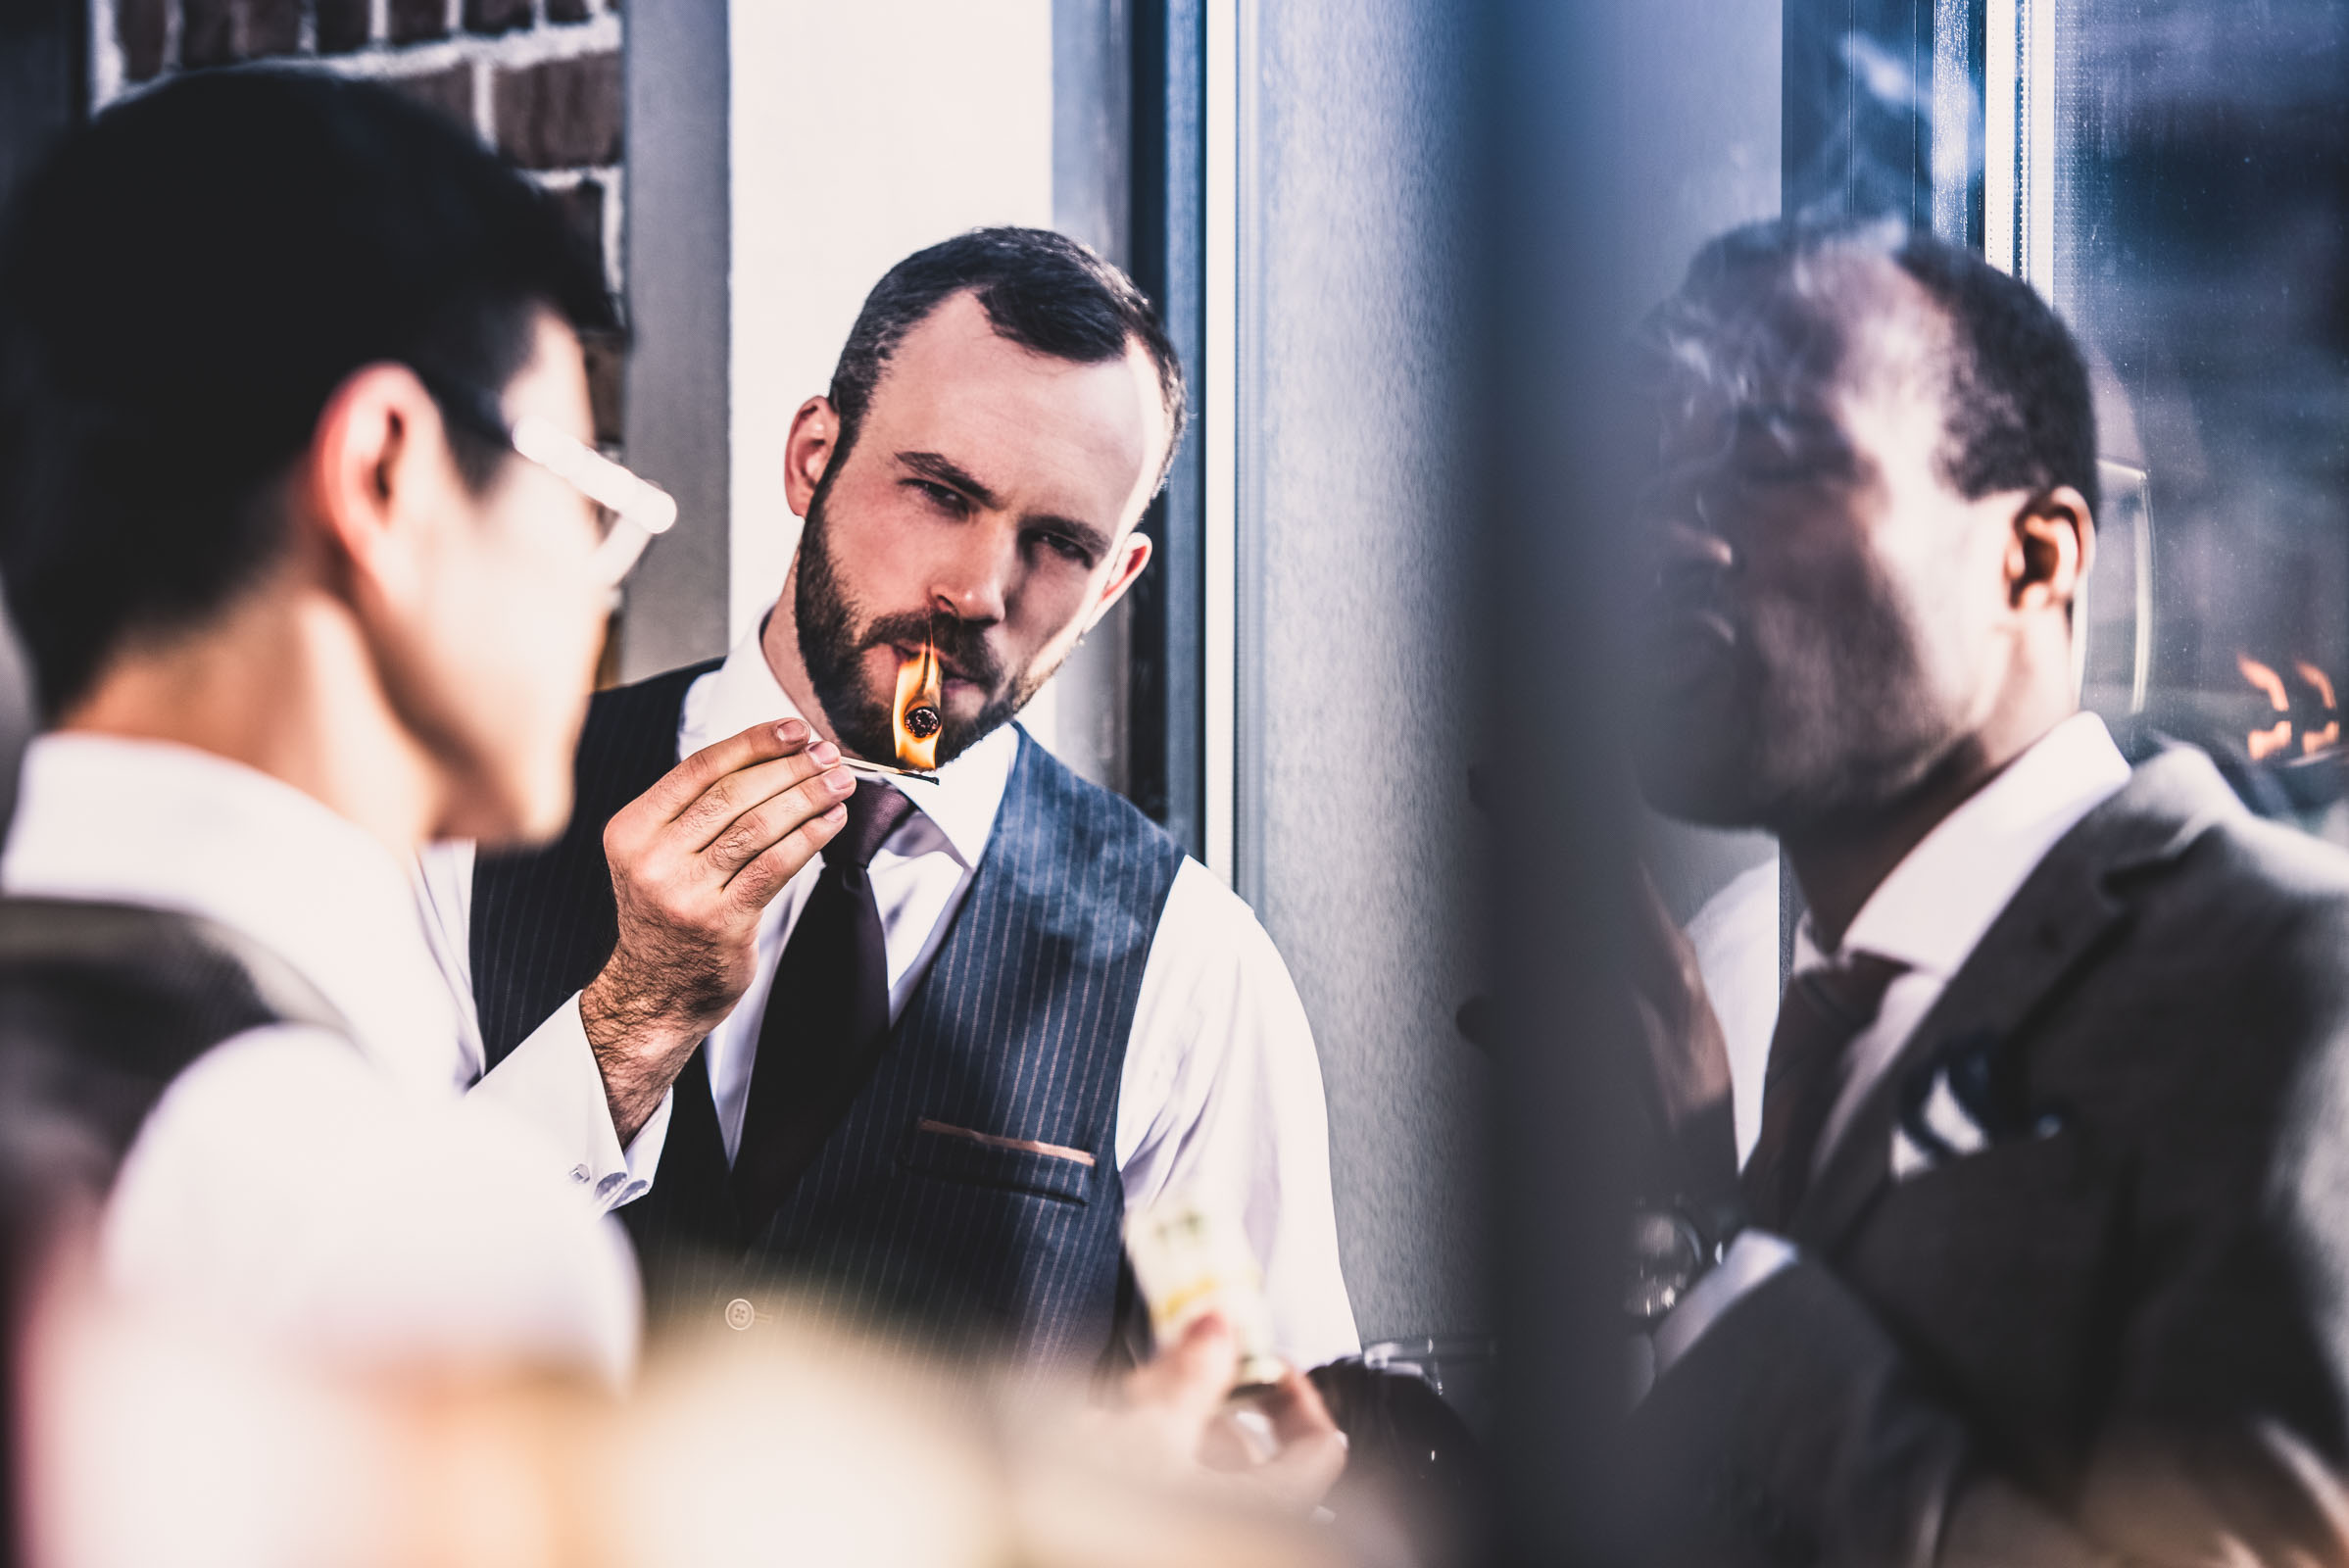 Zigarrenroller | Zigarrendreher |Zigarrentabak |Hochzeit |Event |Gala | Business |Buchen |Mieten